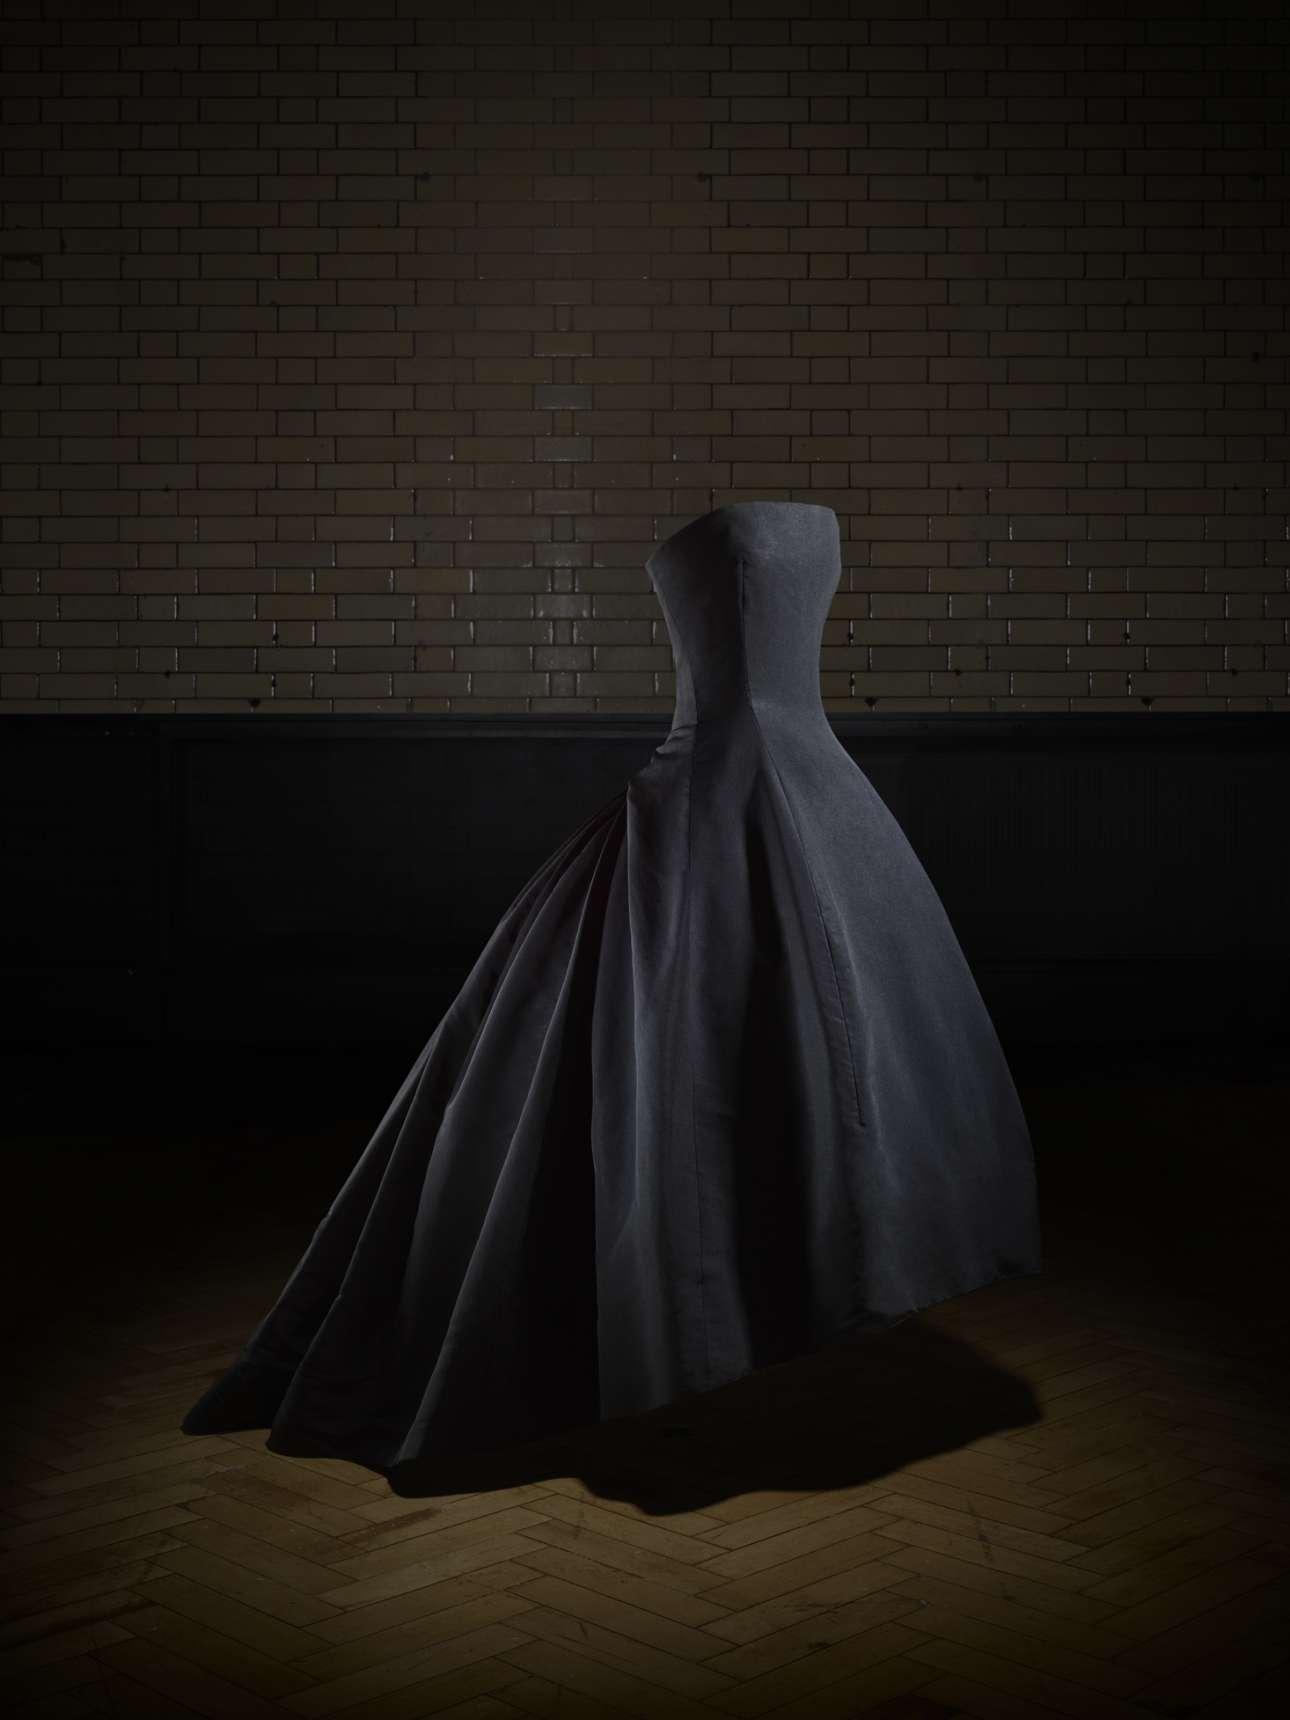 «Soirée de Décembre»: Βραδινό φόρεμα από την κολεξιόν υψηλής ραπτικής Φθινόπωρο/Χειμώνας του 1954, δώρο στο V&Α από τη θρυλική χορεύτρια Μαργκότ Φοντέιν